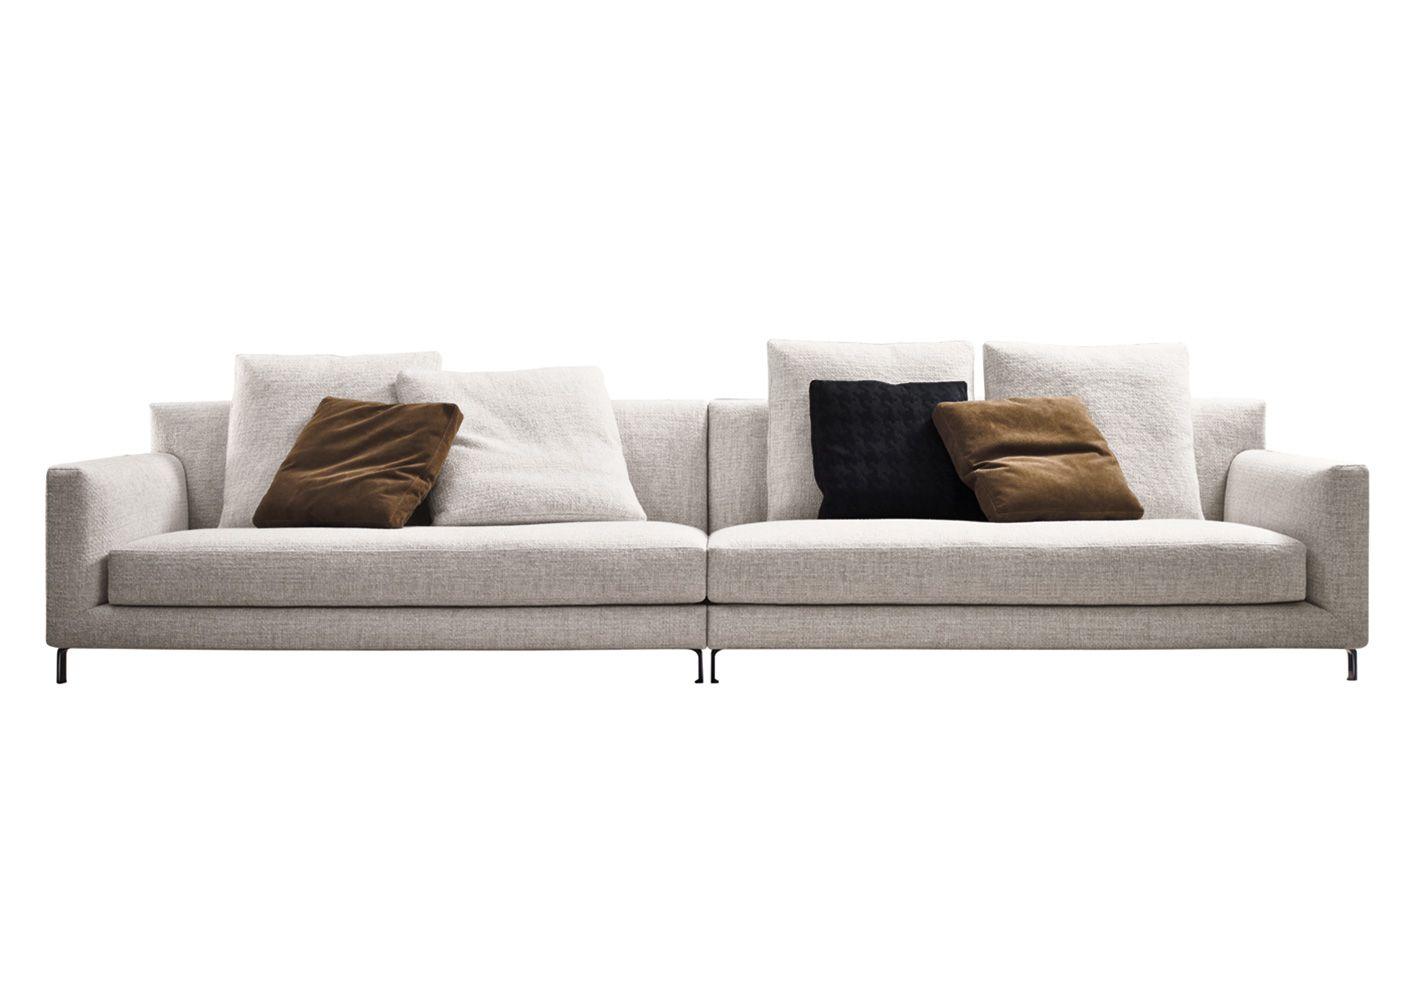 Minotti Sofas Australia Leather Sofa Pottery Barn Knock Off Allen Furniture Seating Pinterest